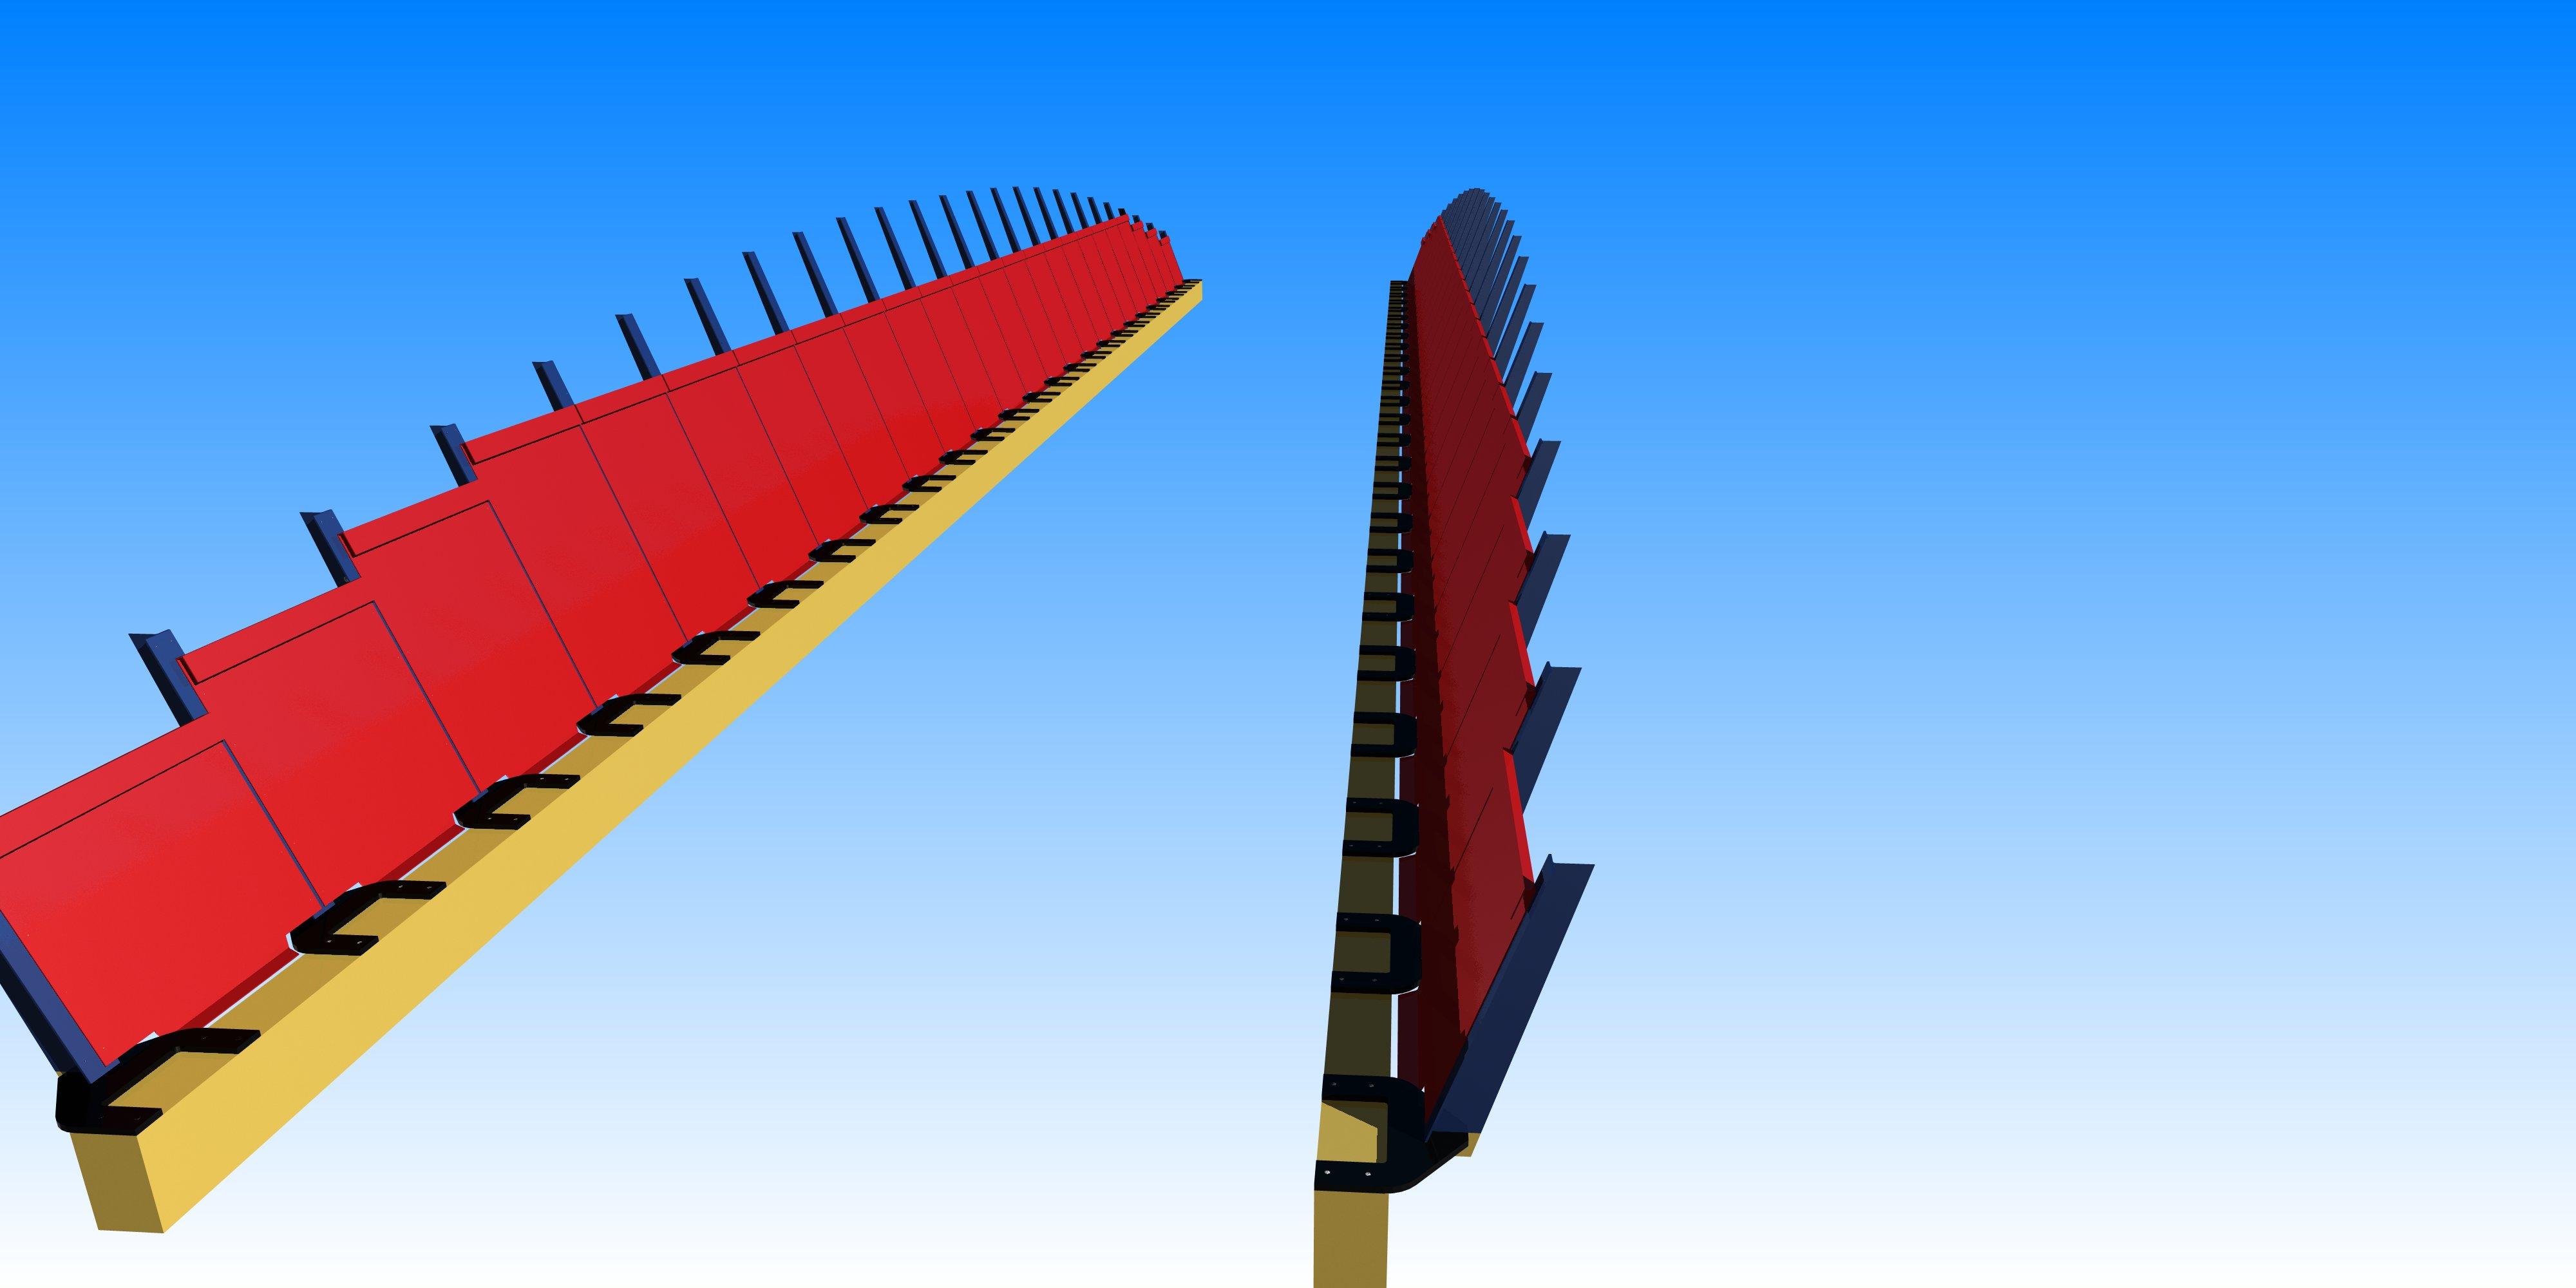 - The Engineering Design